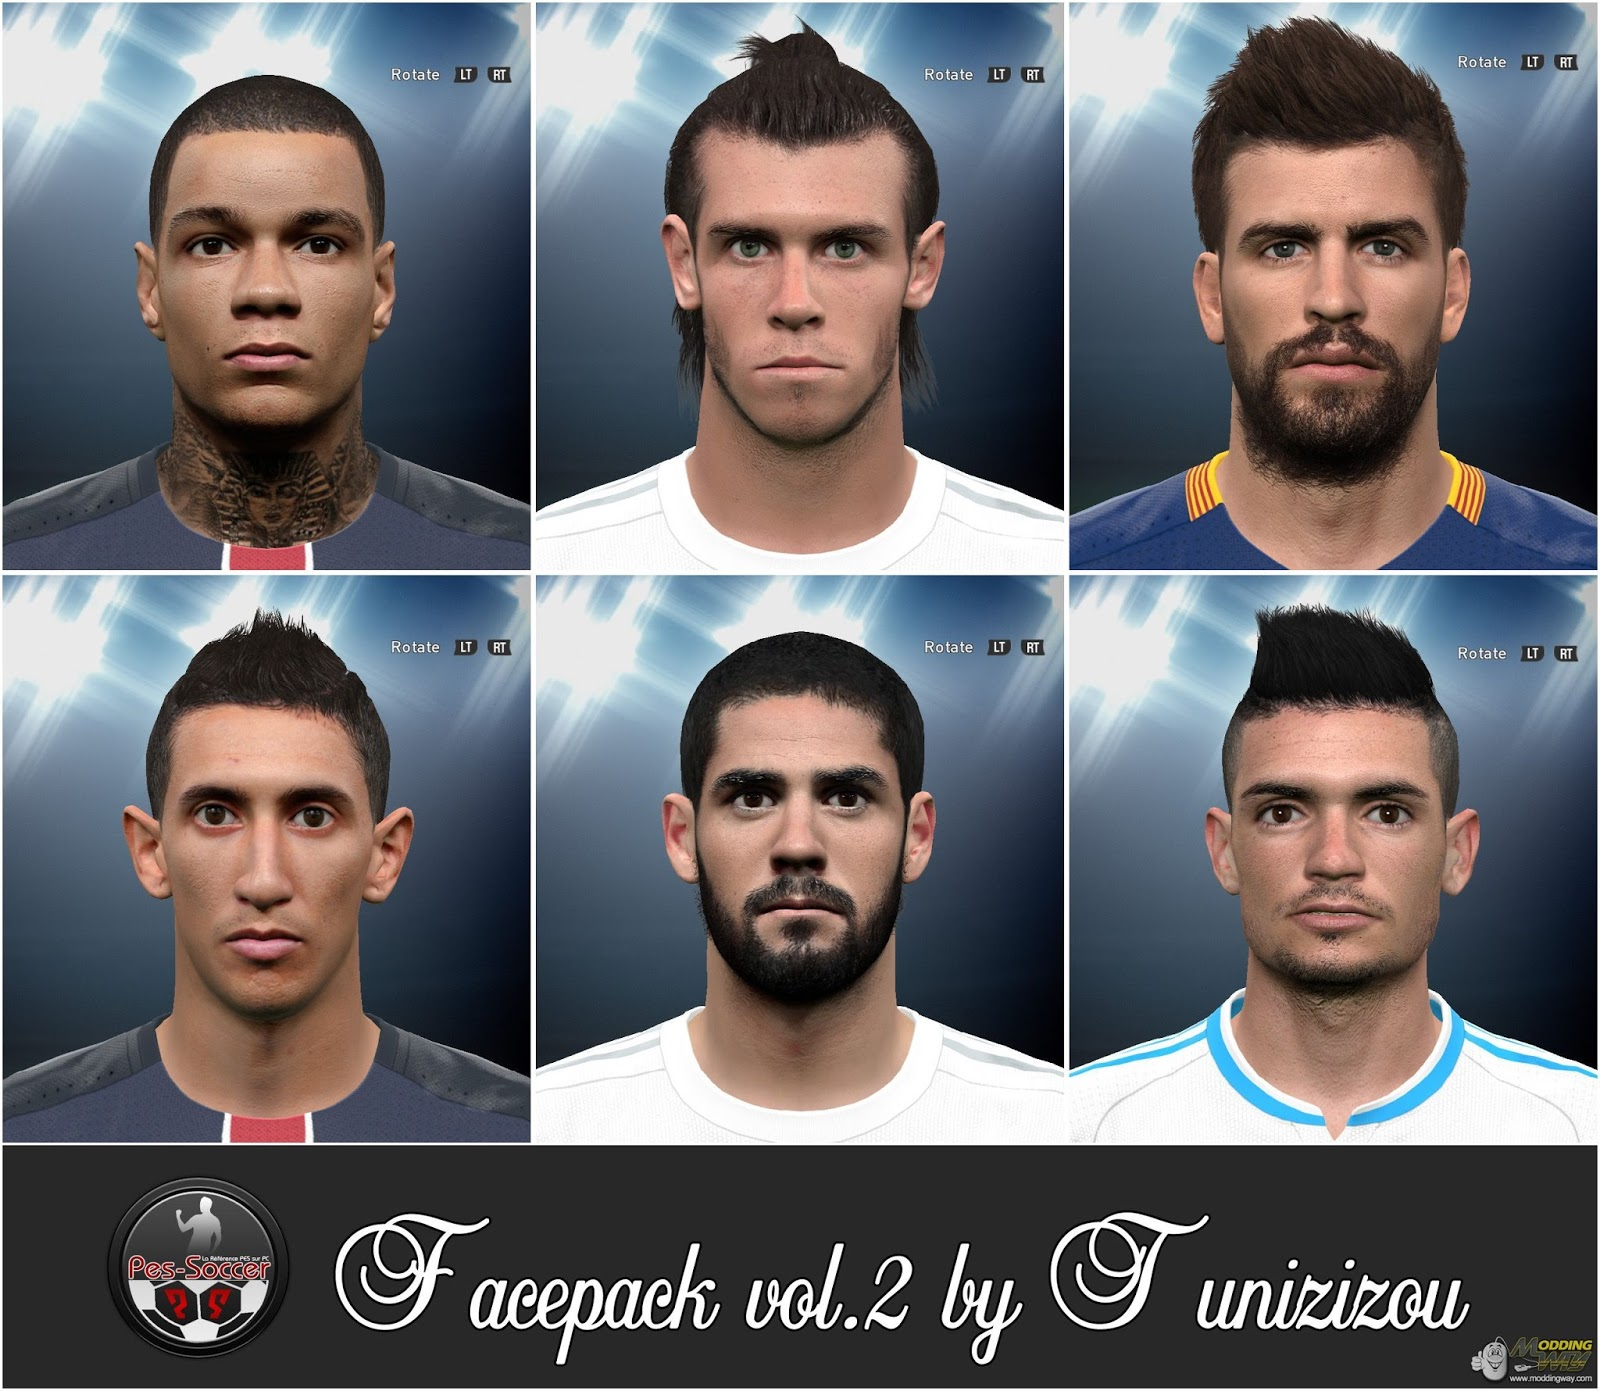 Pro Evolution Soccer 2015 - GameCopyWorld - Mirrors - No